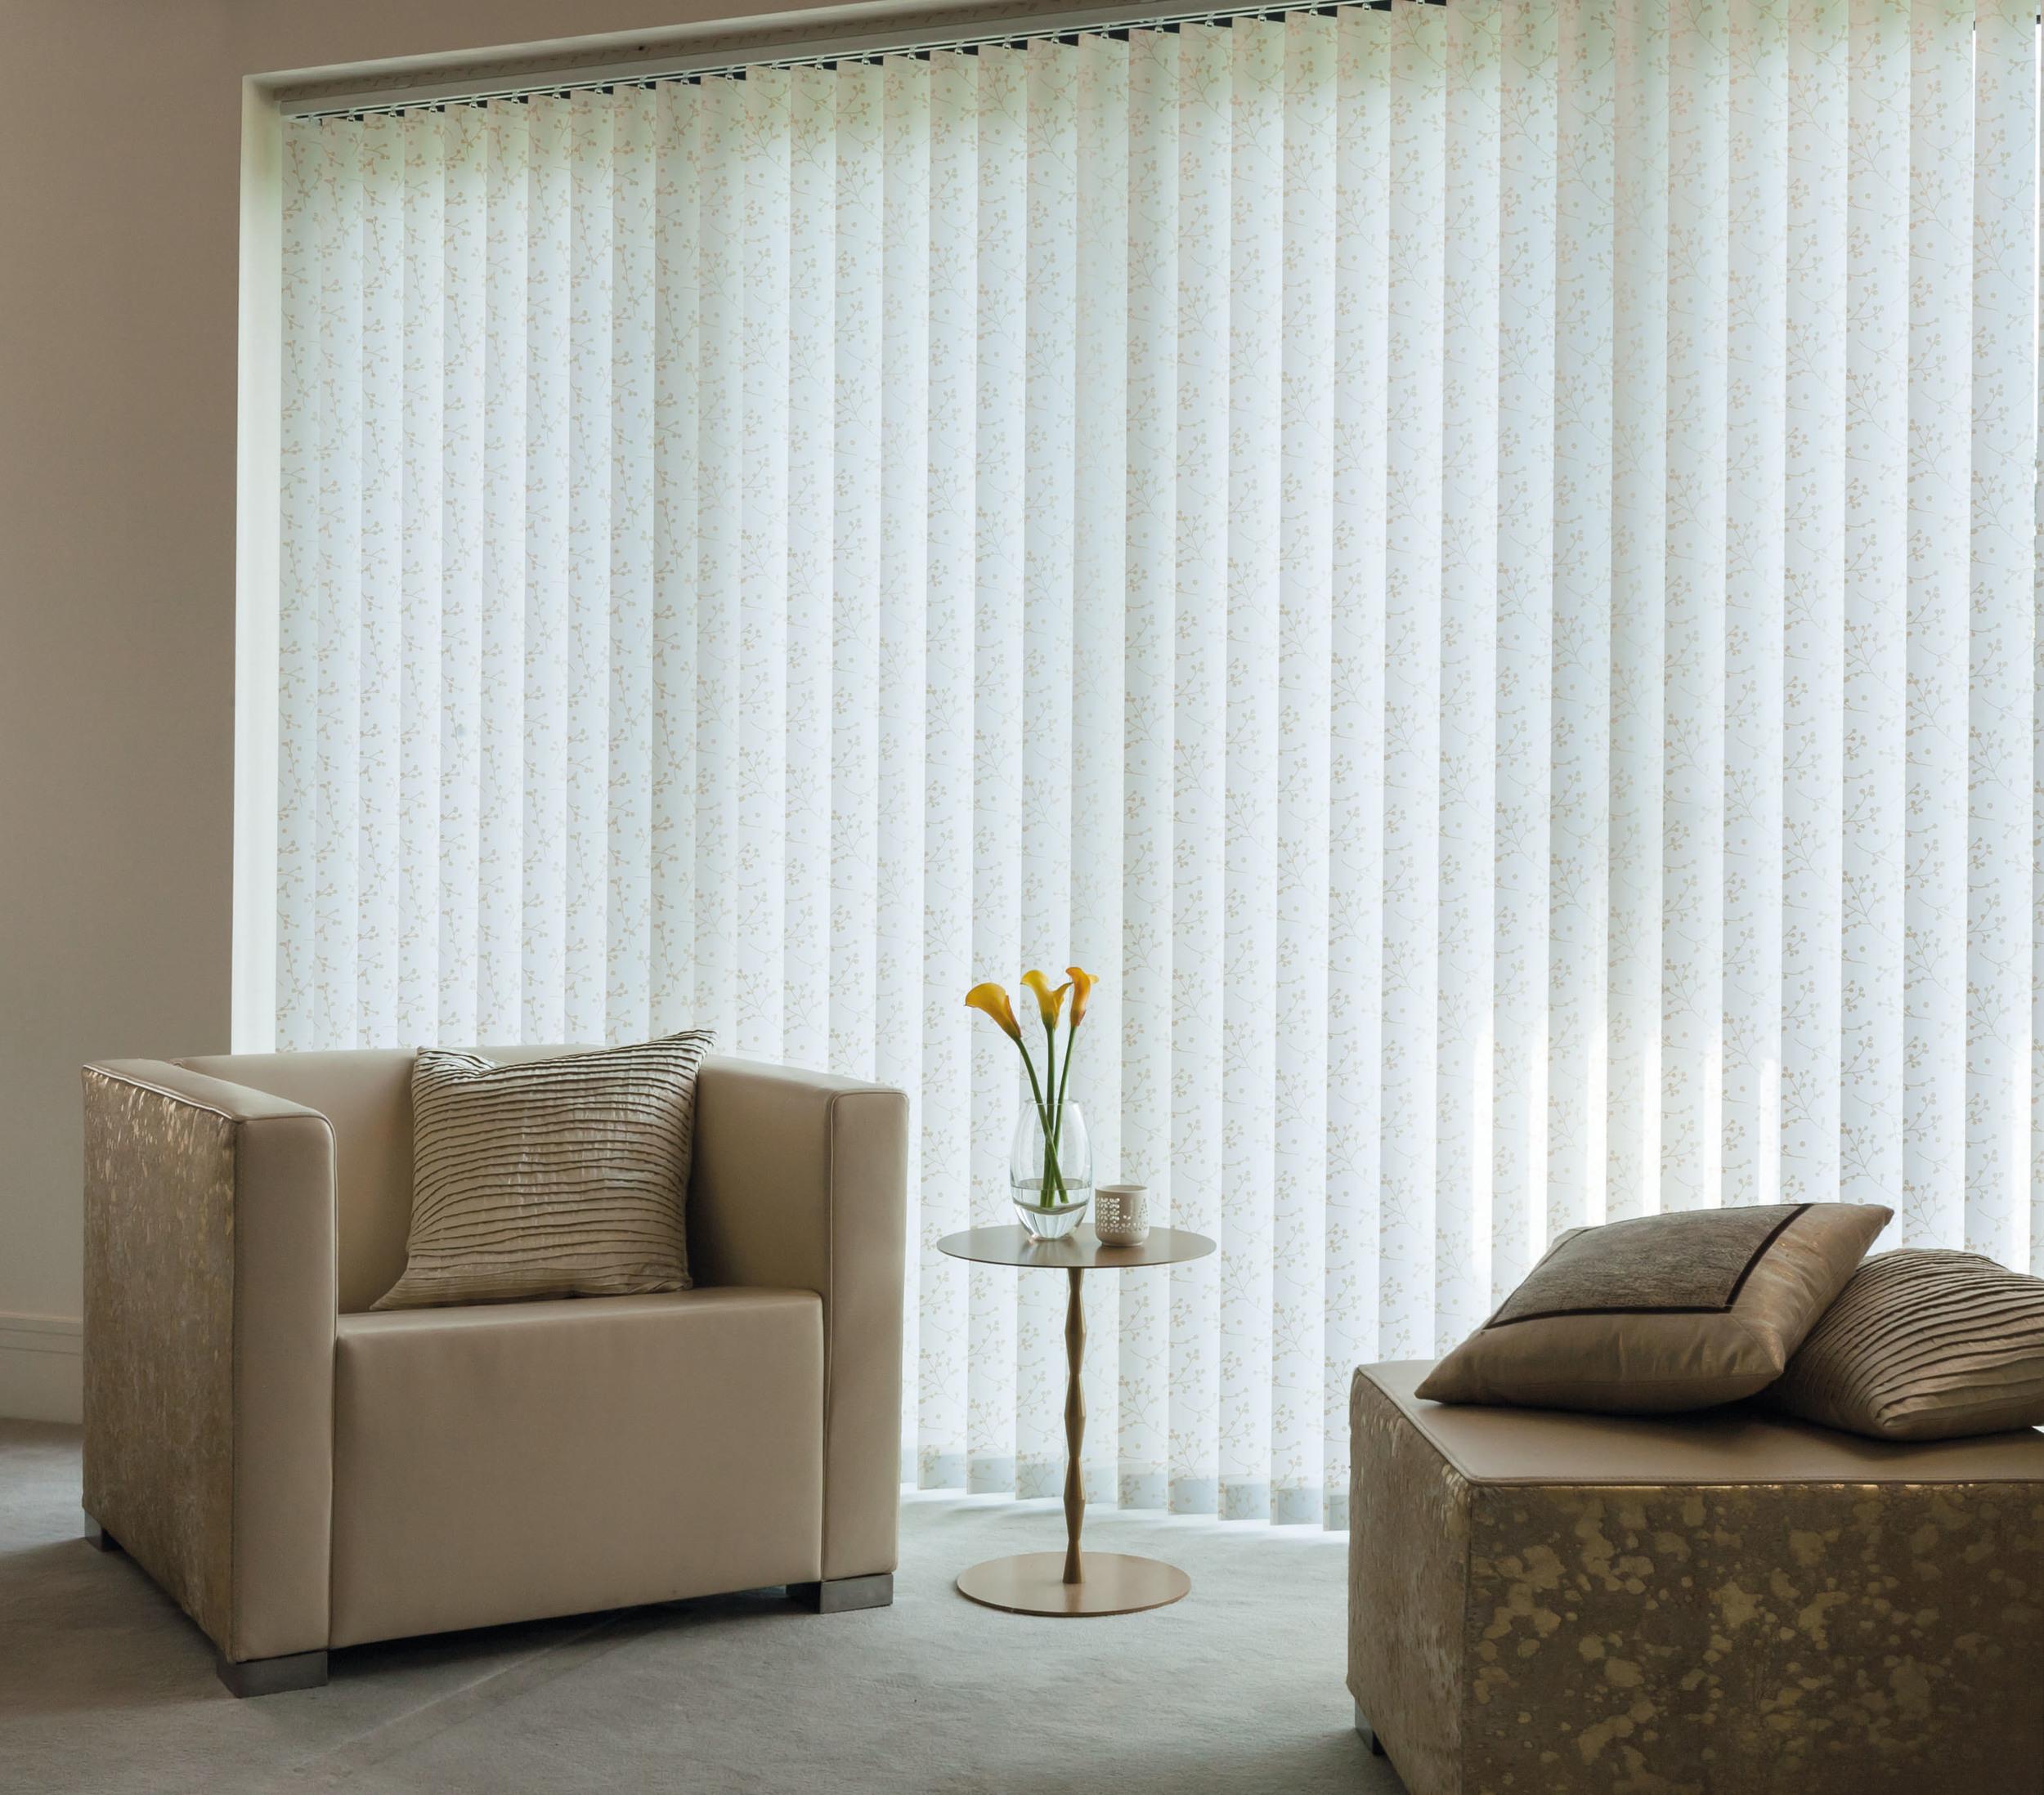 by room austrian nyc treatments shades blinds shutters nj window vwf bathroom